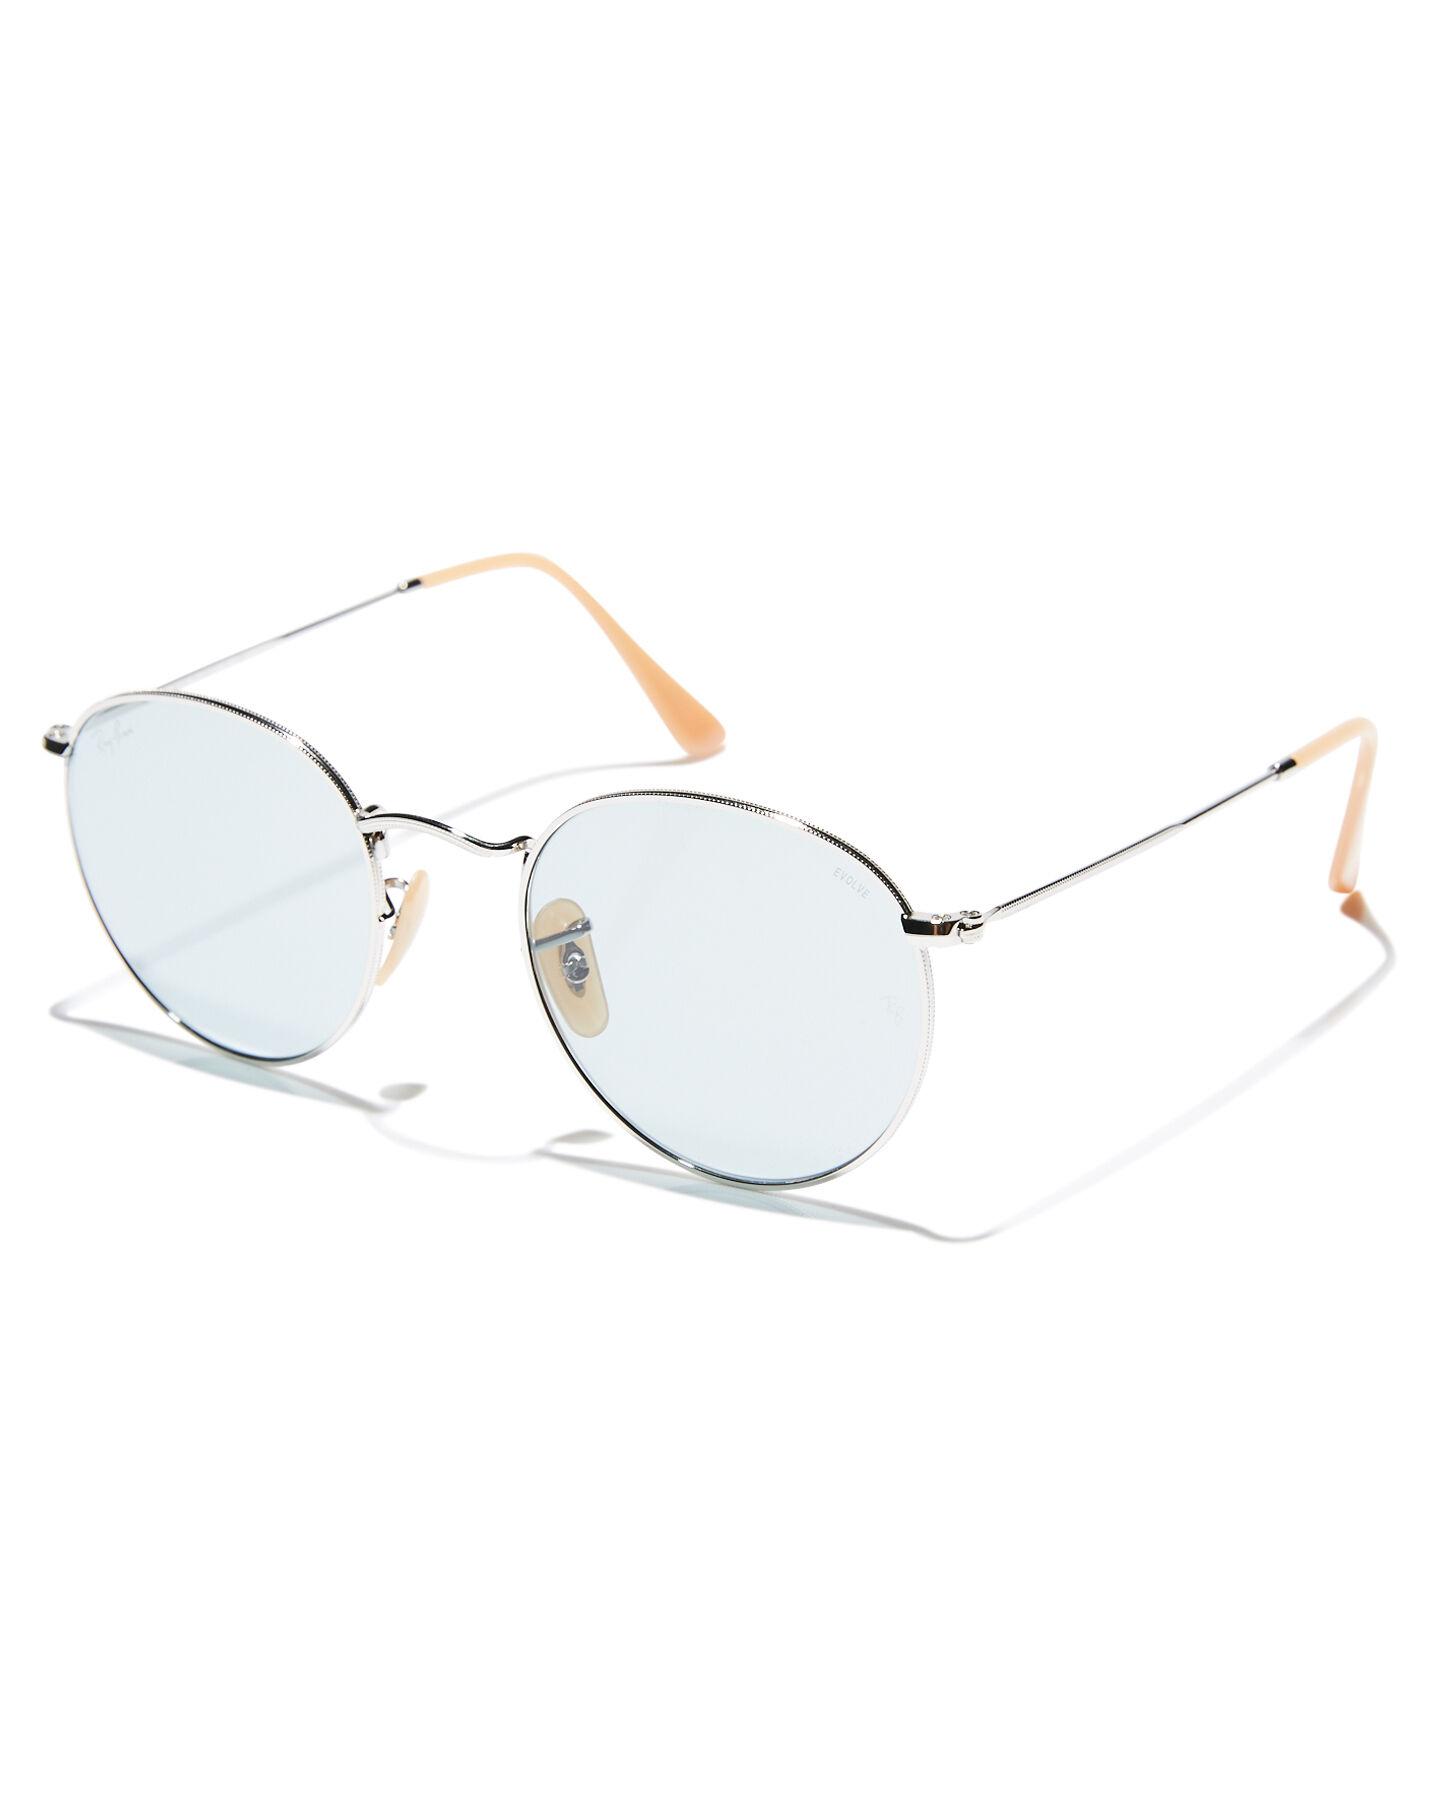 9fda630342f1 ... round sunglasses 53mm a8cb2 46e2f  buy blue photochromic mens accessories  ray ban sunglasses 0rb3447silpb 1586e ff3fb